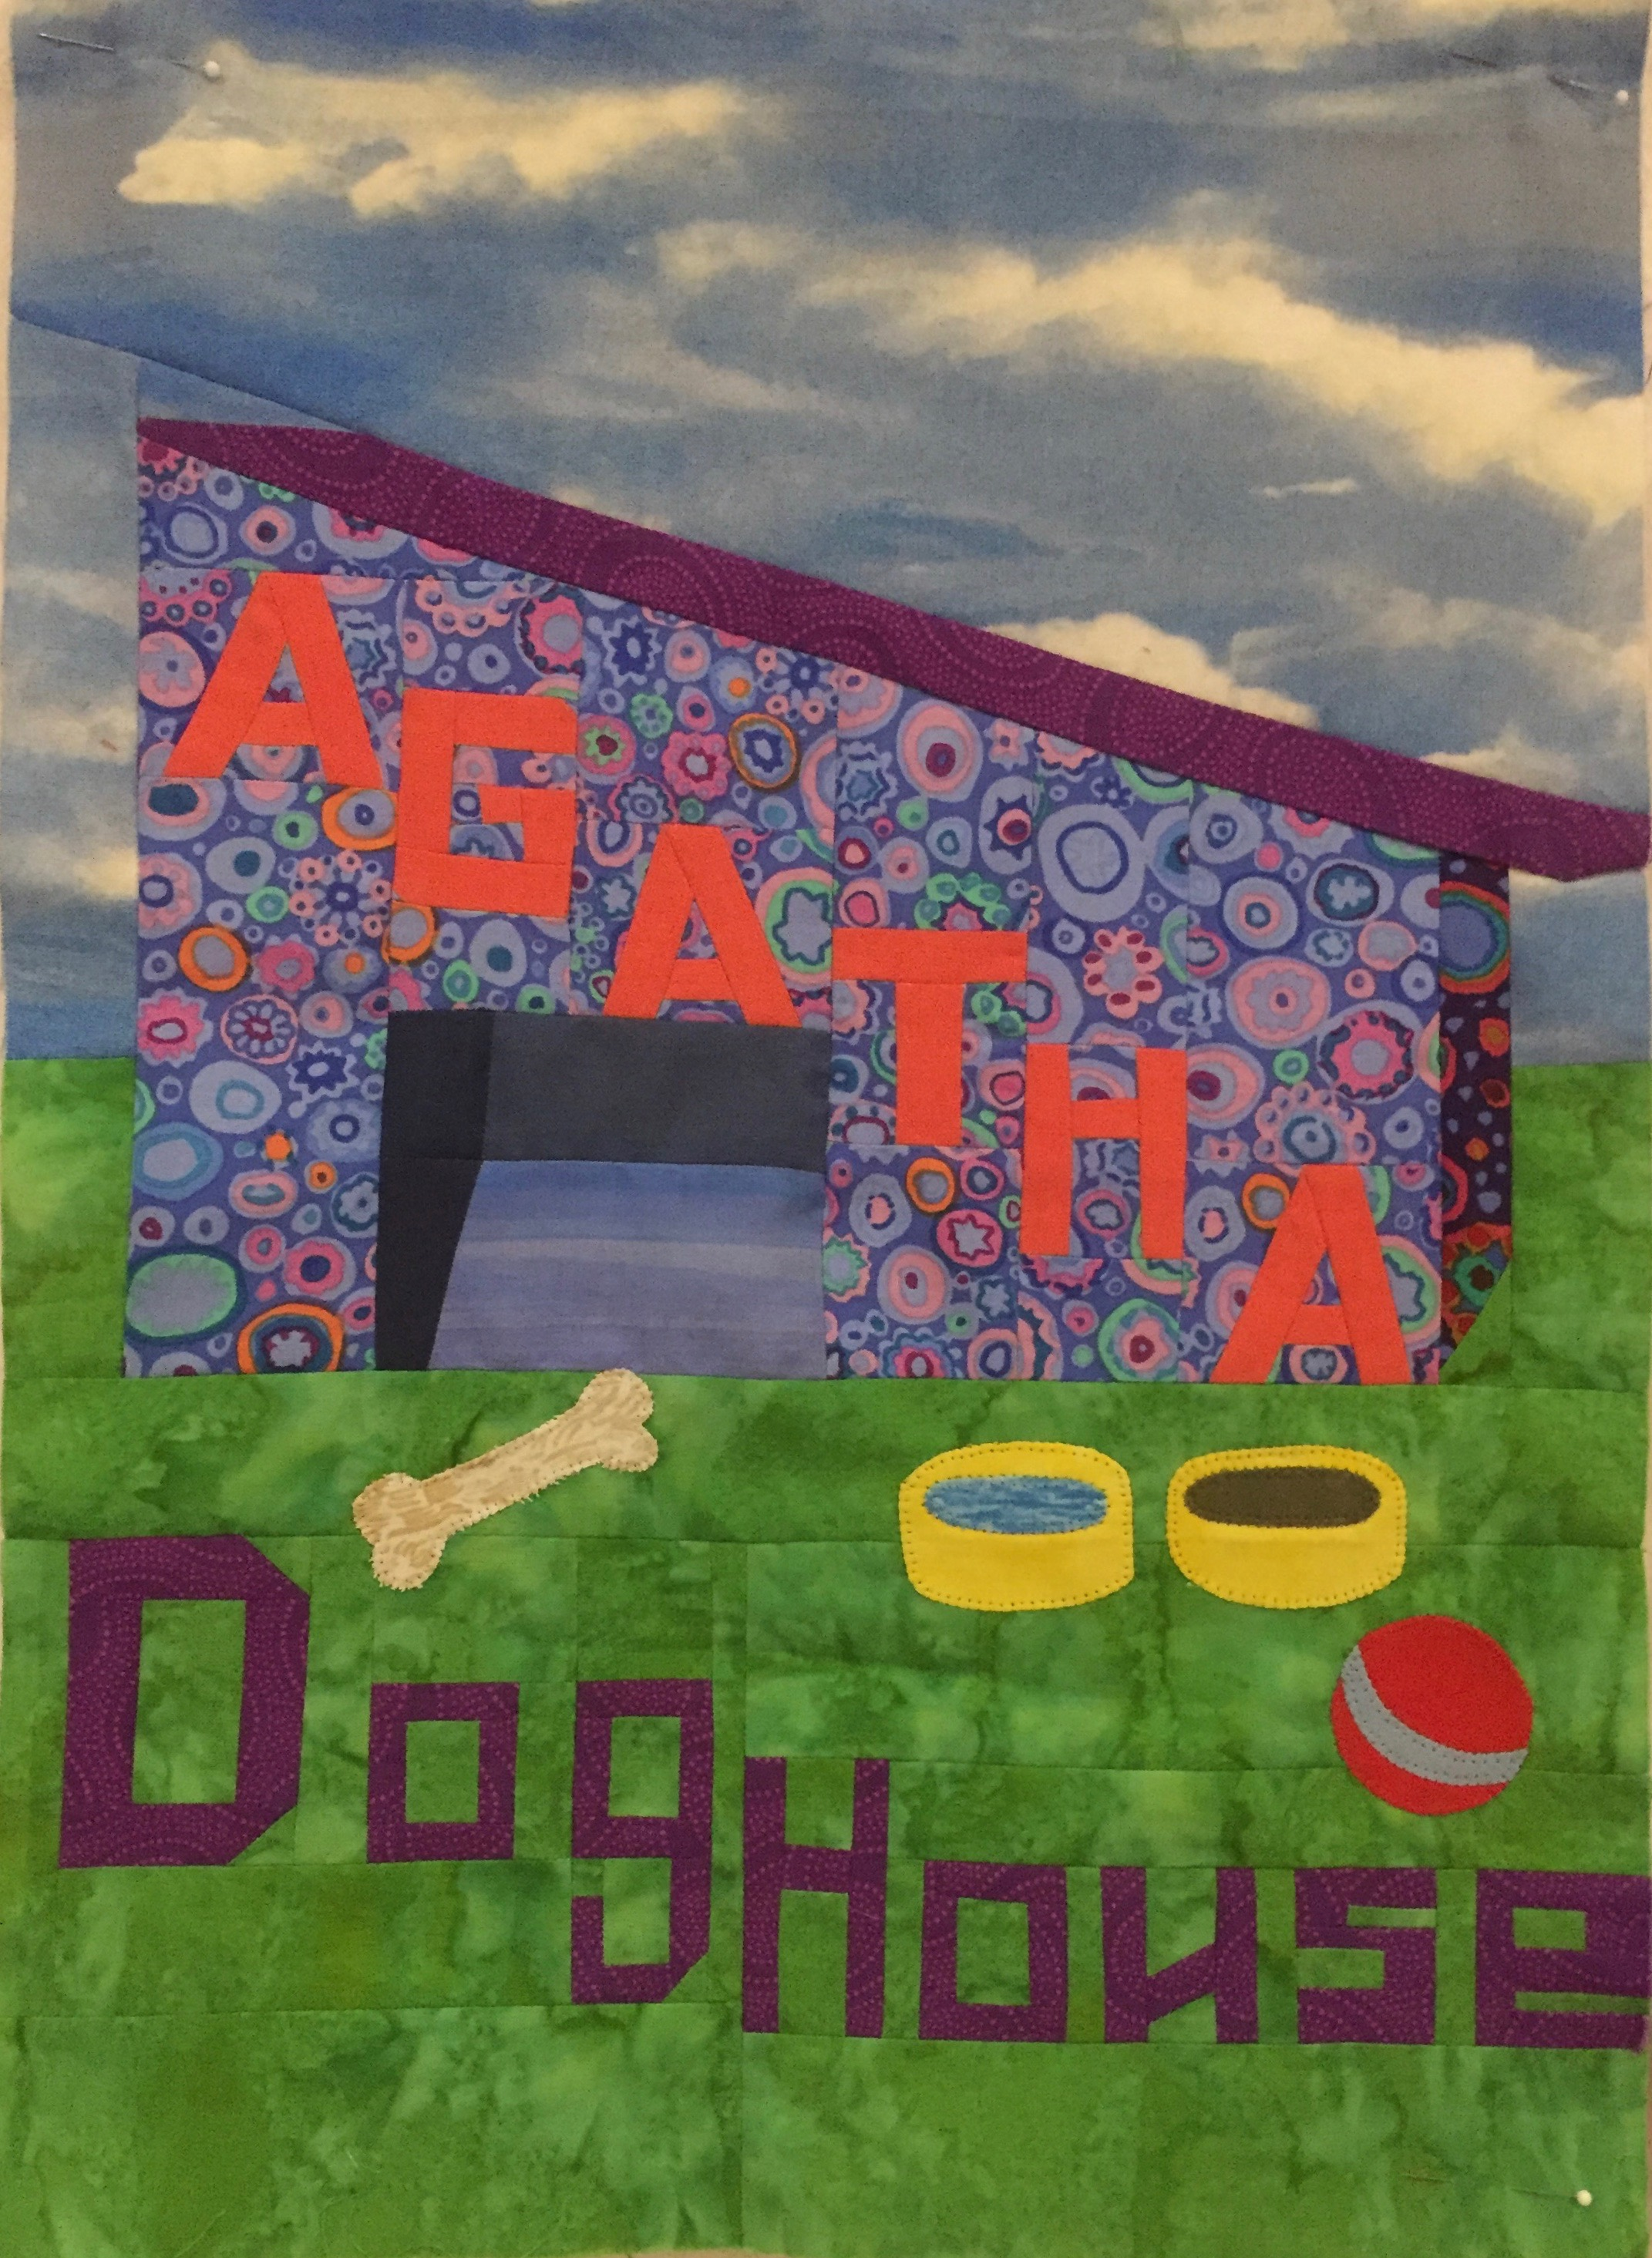 Dog House A Burgess.jpg